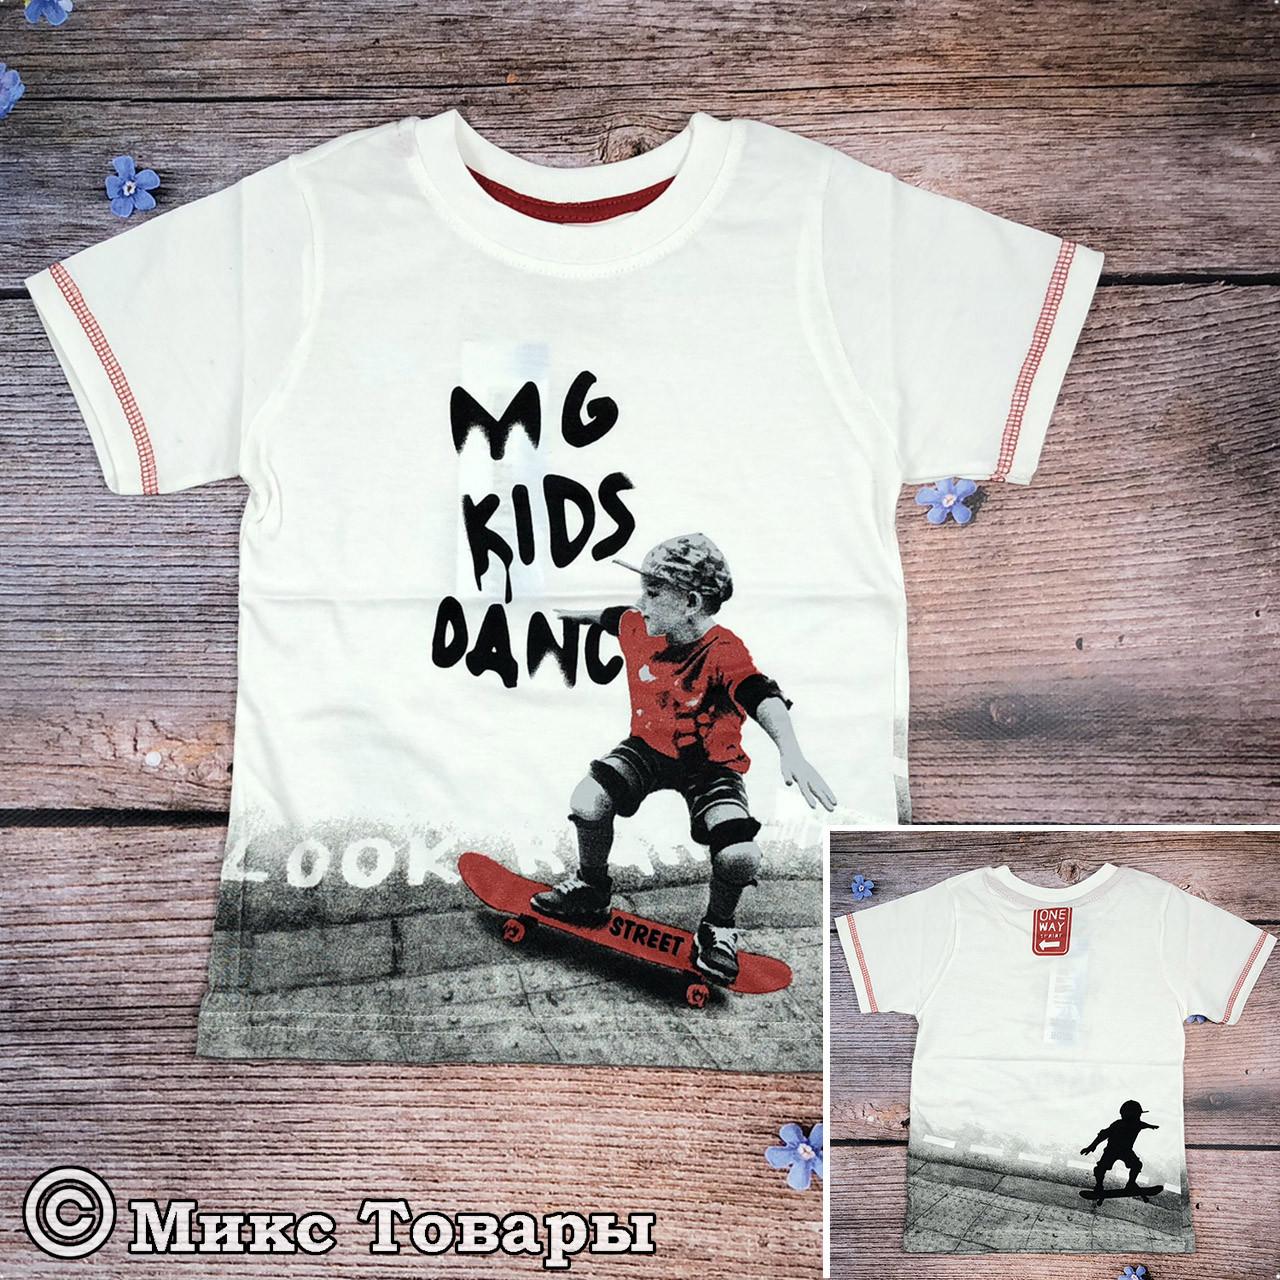 Футболка со скейт бордистам для мальчика Размеры: 92,104,116,128 см (8109-2)